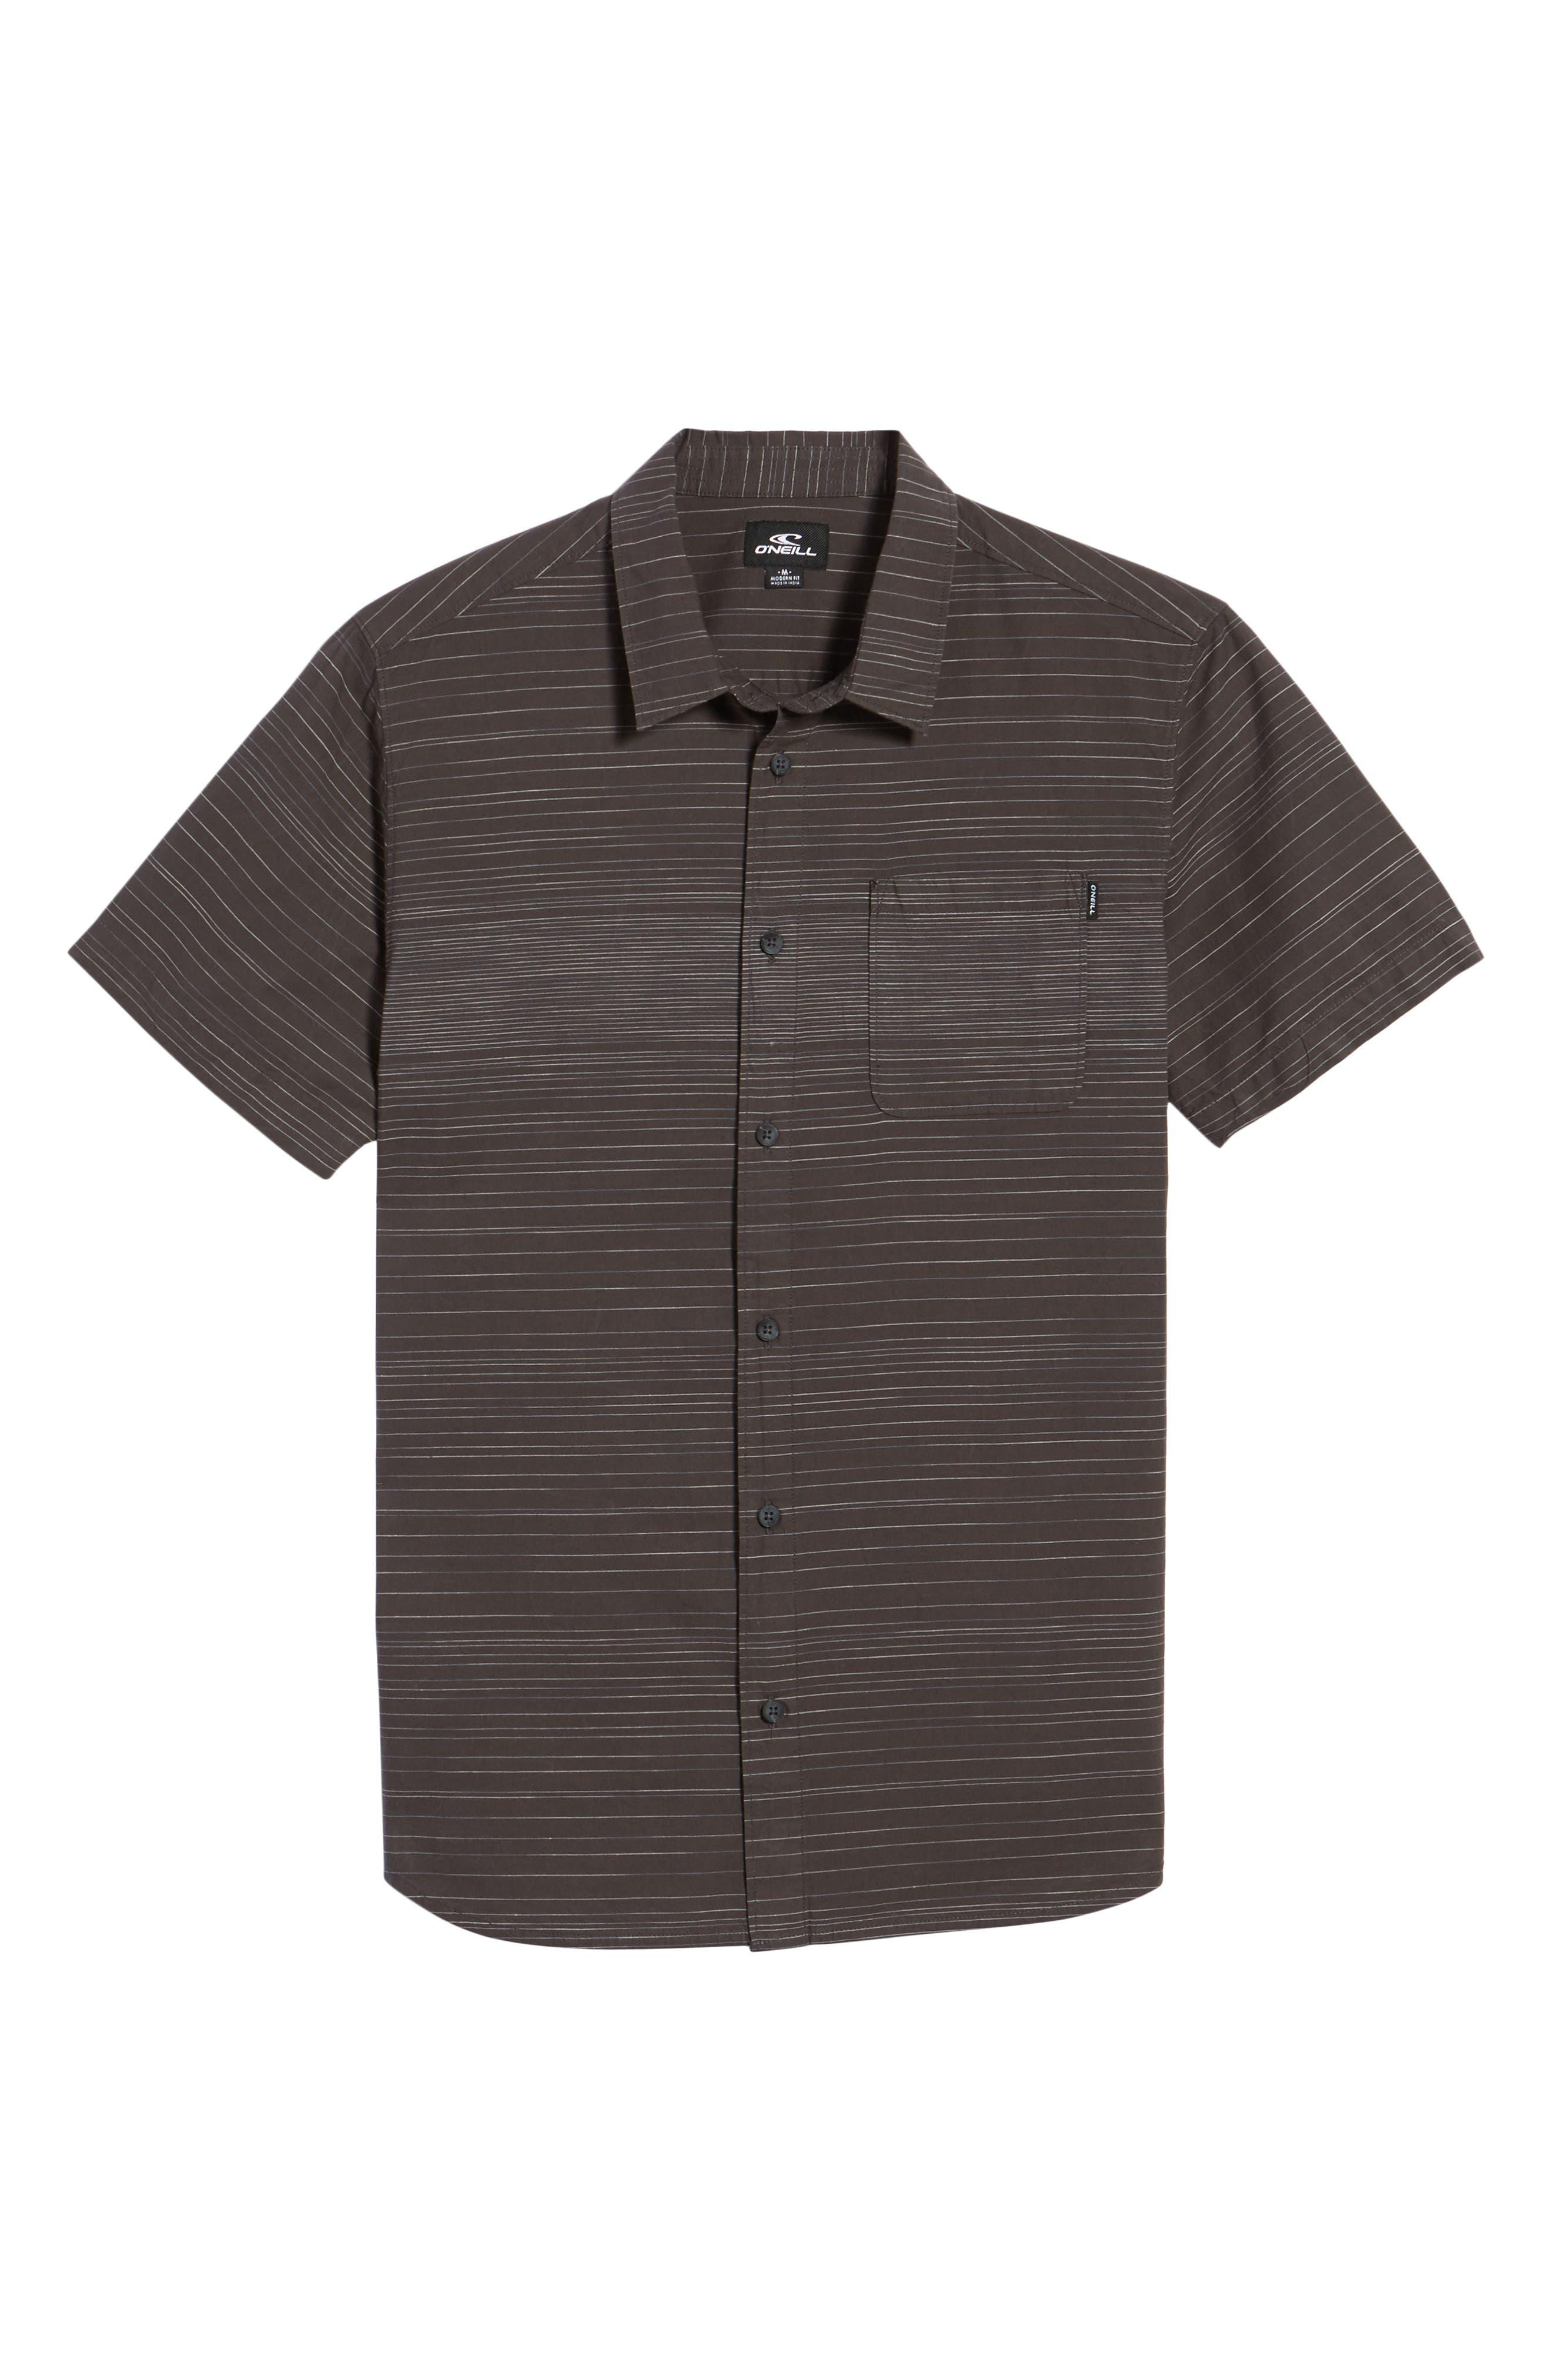 Hound Woven Shirt,                             Alternate thumbnail 6, color,                             020